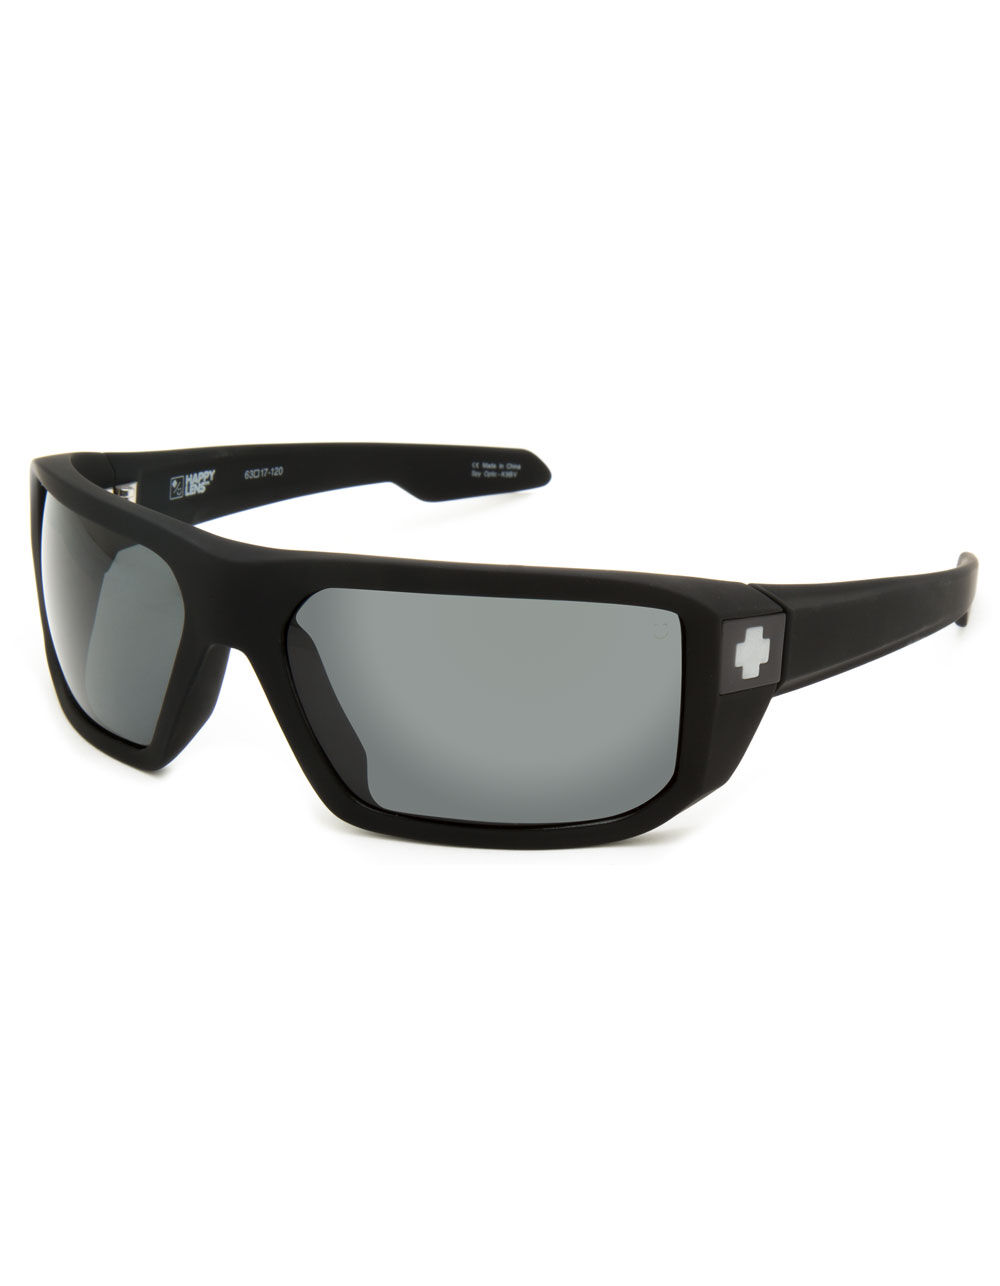 SPY Happy Lens McCoy Sunglasses